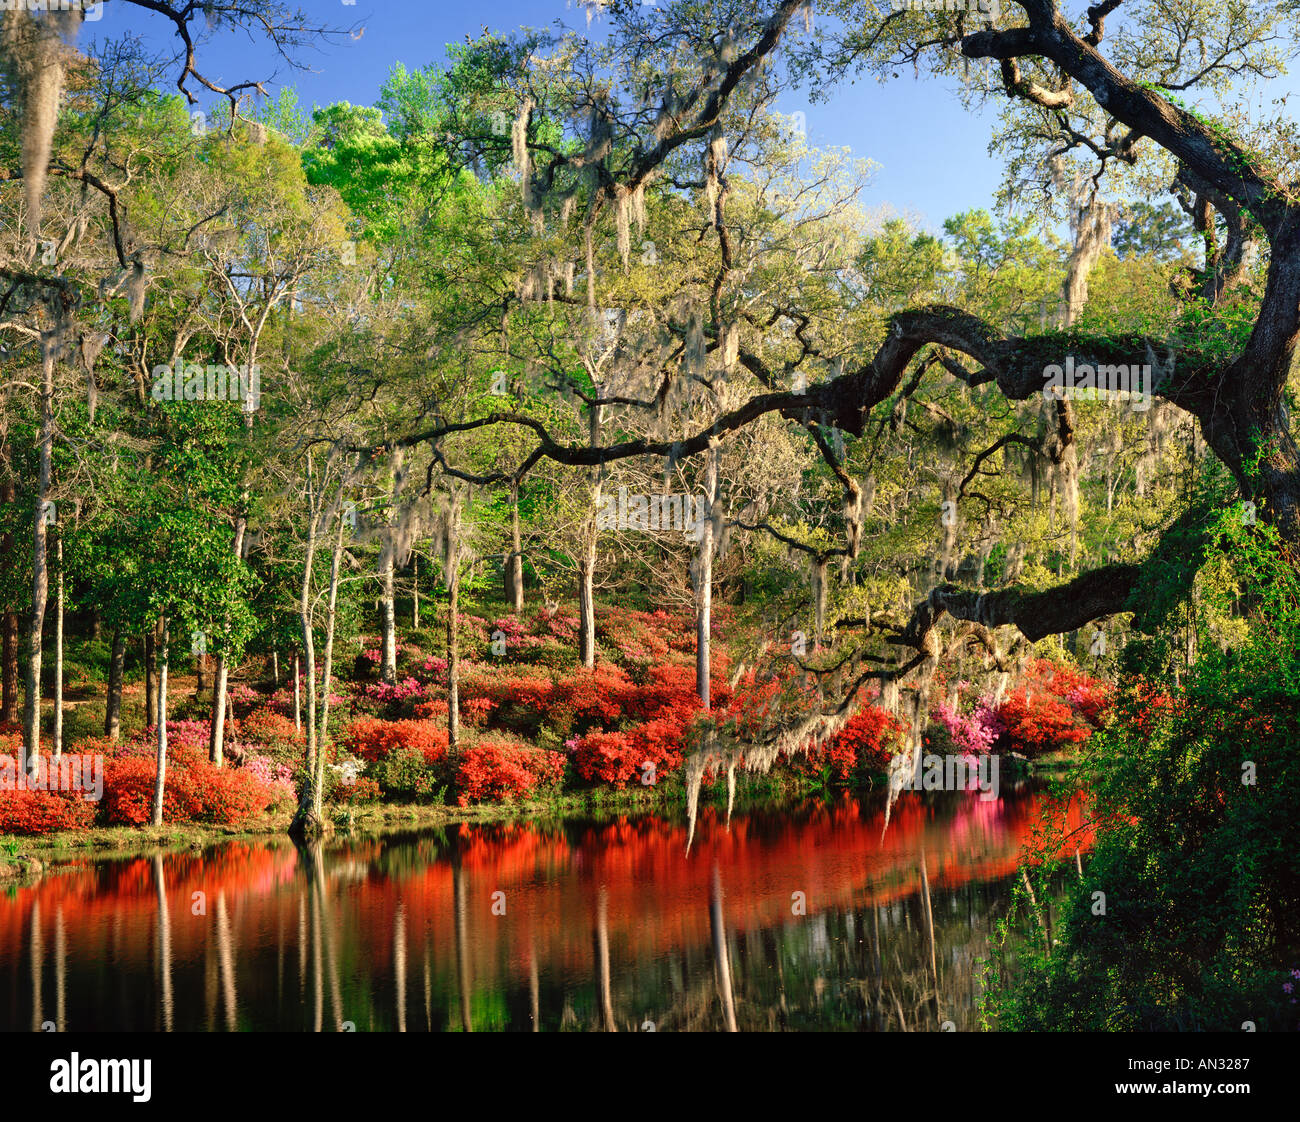 Magnolia Gardens Near Charleston South Carolina Usa Stock Photo Royalty Free Image 1389190 Alamy